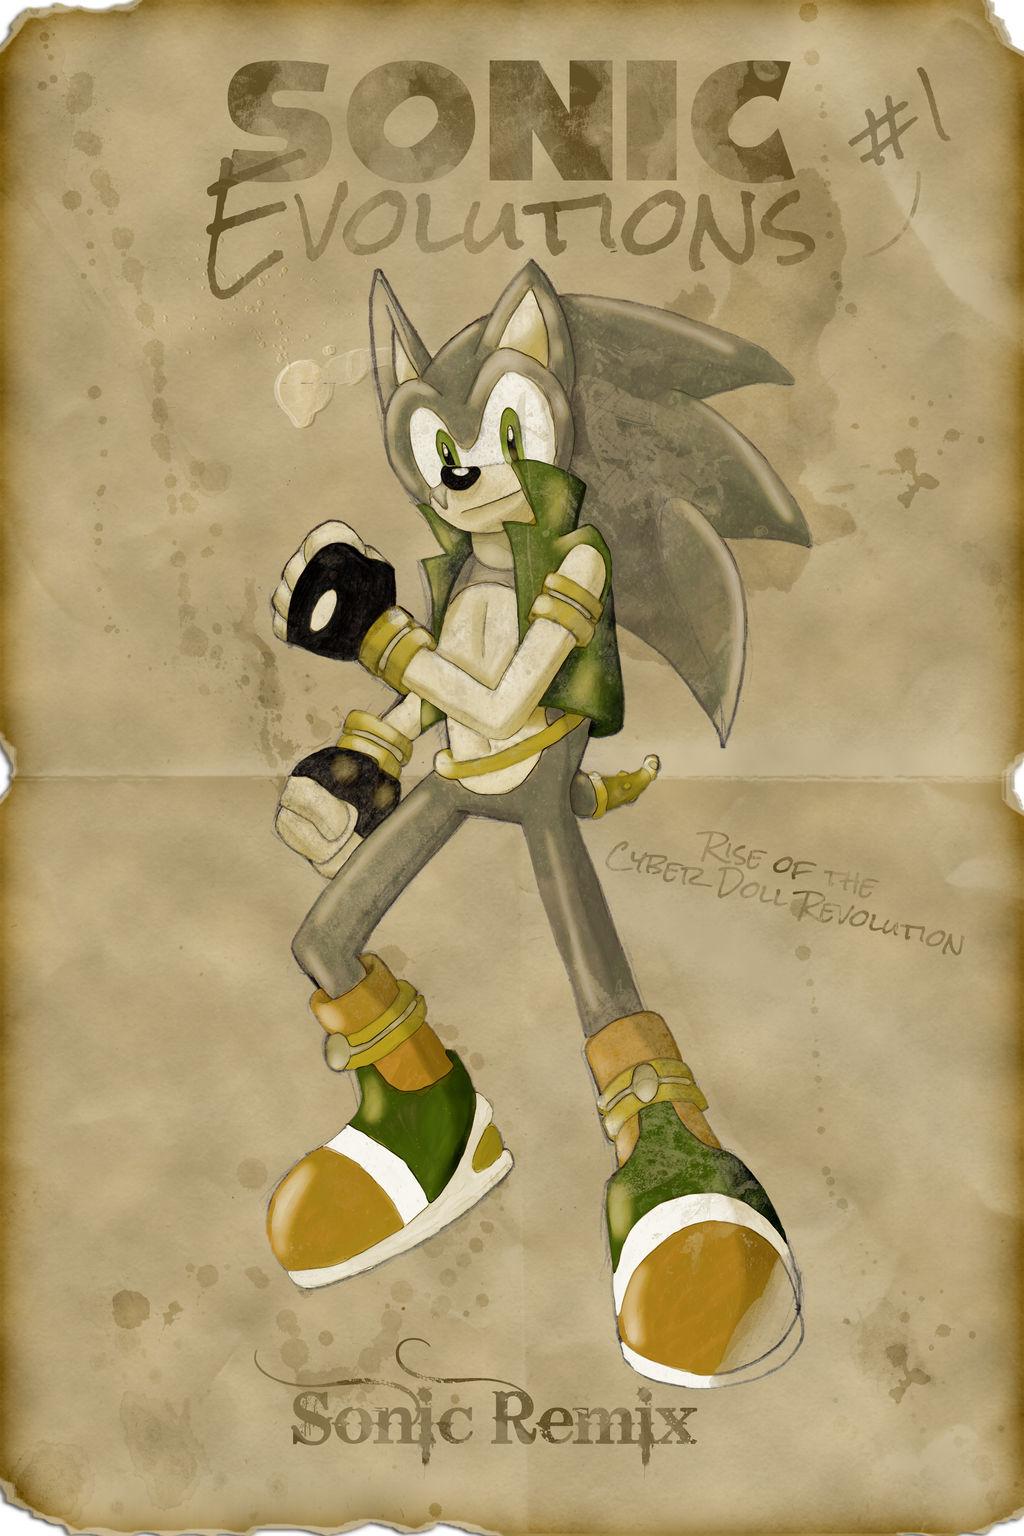 Sonic Evolutions: The Cyber Doll Revolution #01